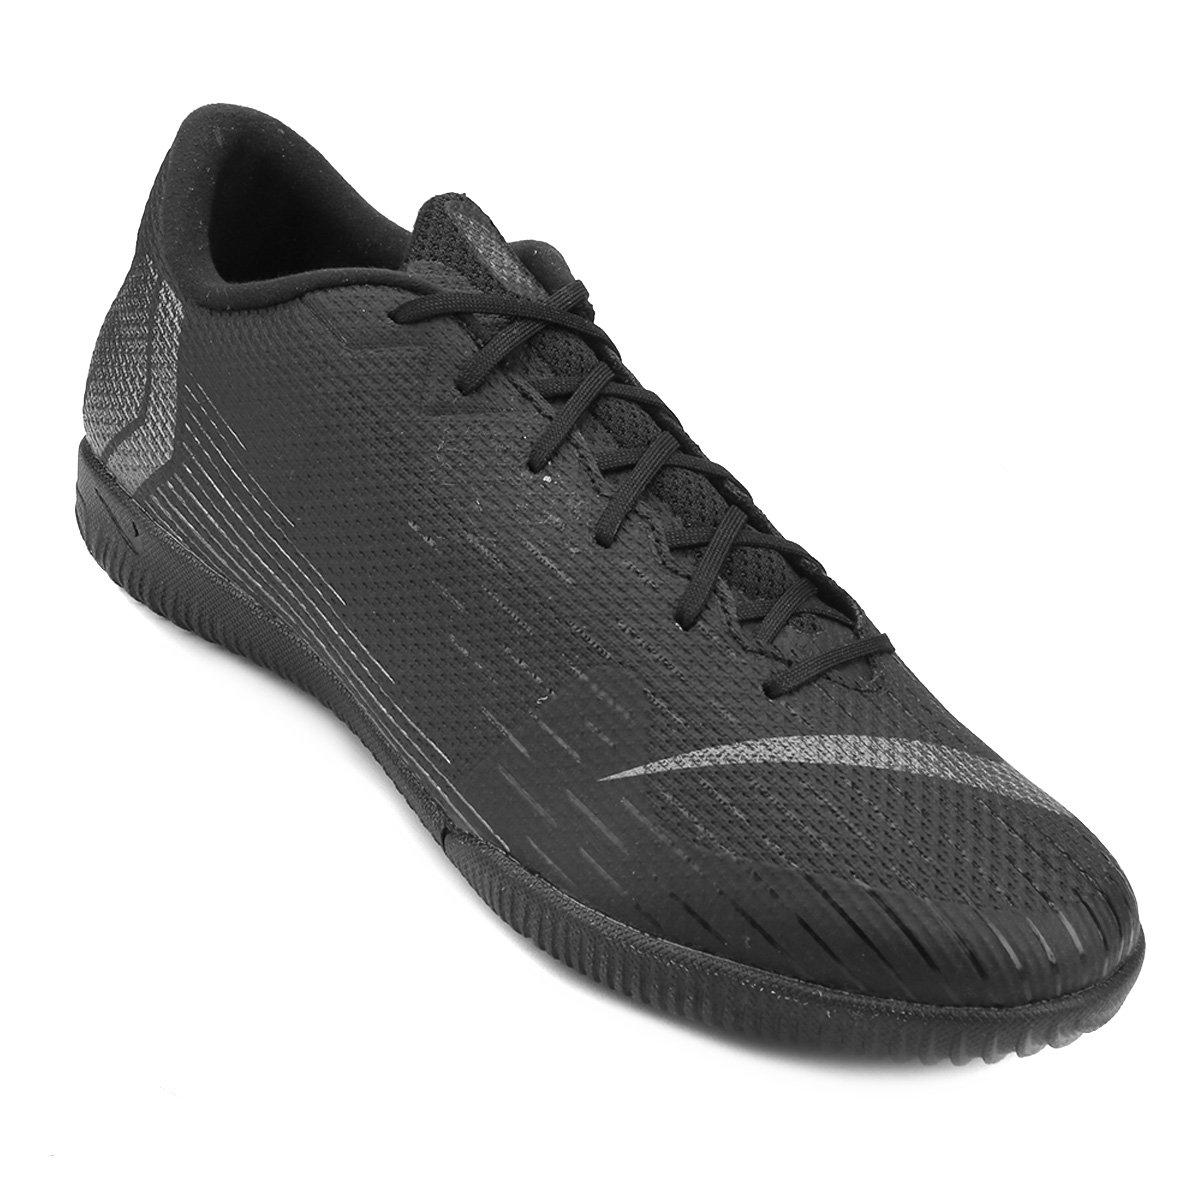 Chuteira Futsal Nike Mercurial Vapor 12 Academy - Preto - Compre ... 14b0ecb1759da